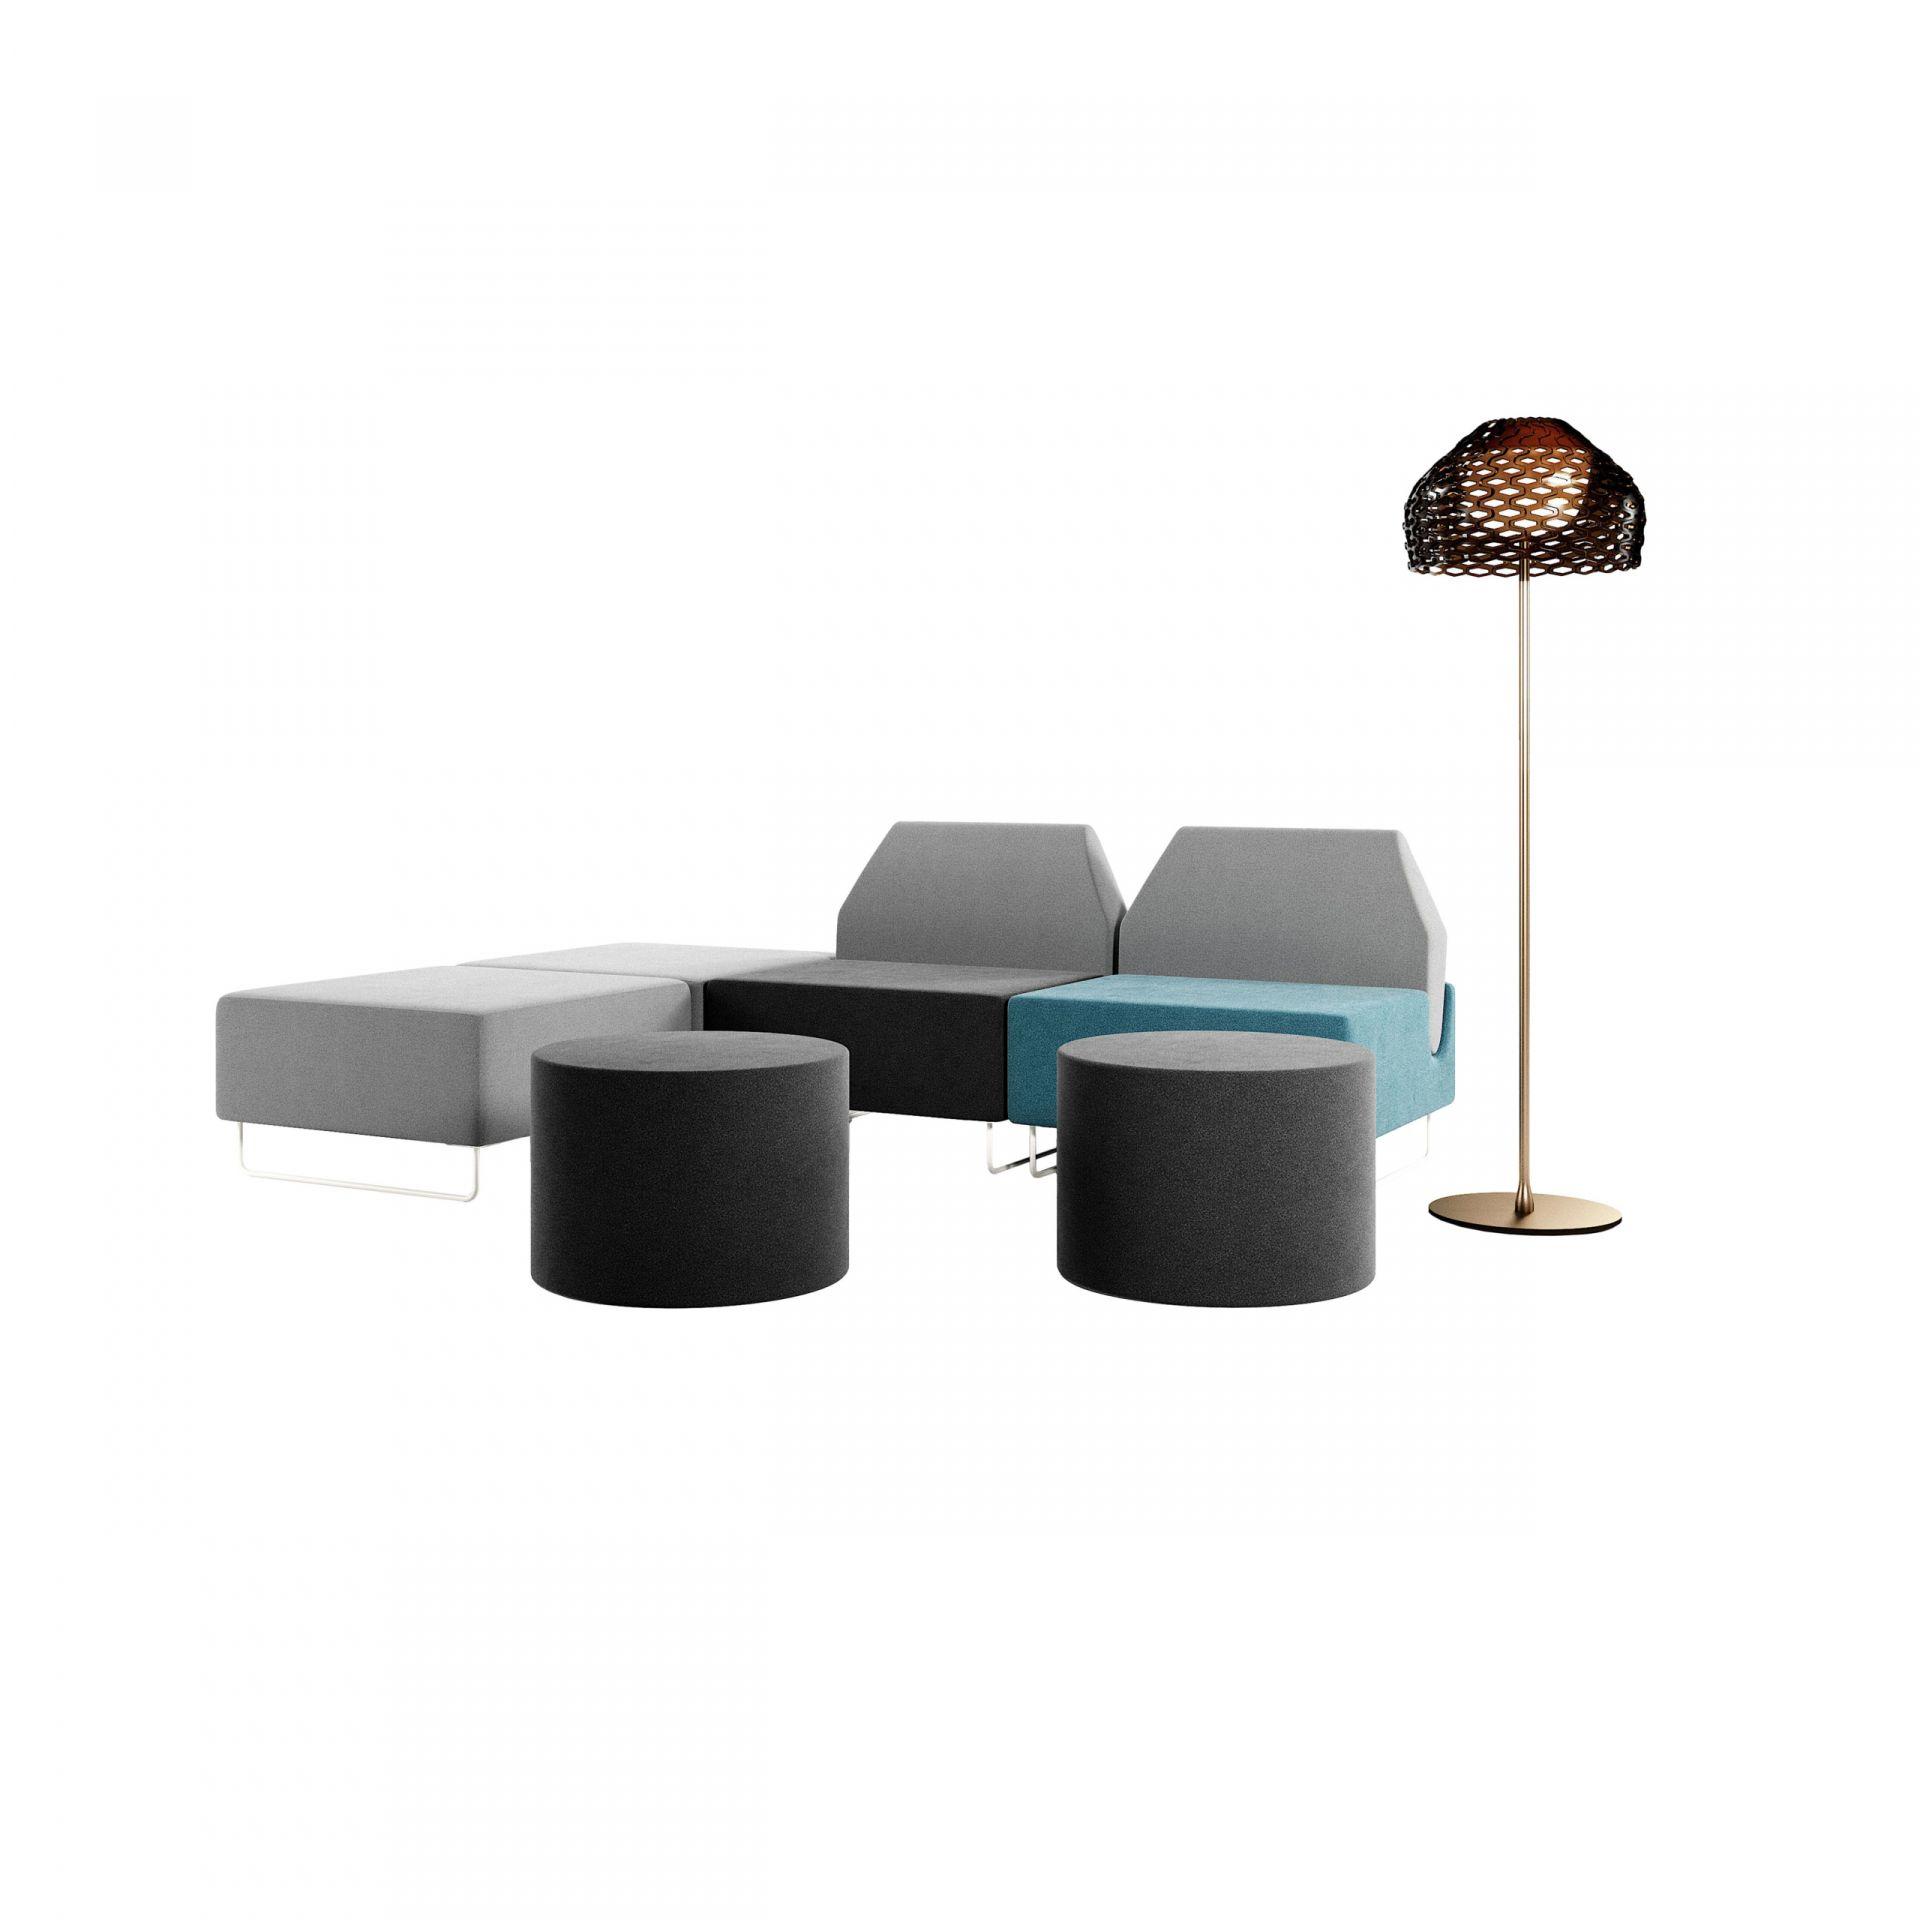 Intouch Moduluppbyggd soffa produktbild 2